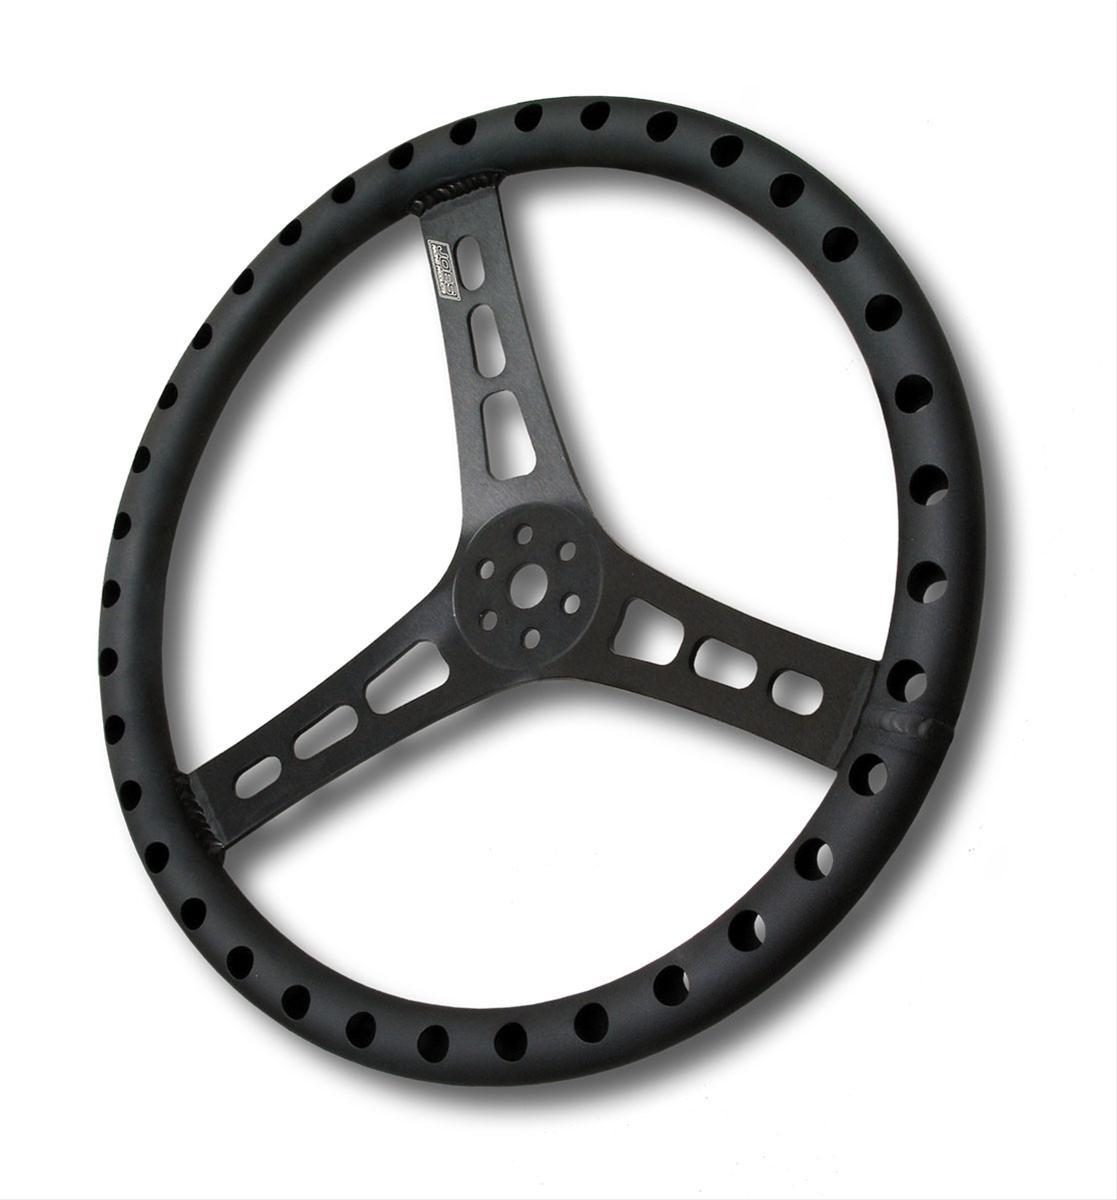 Joes Racing Products Aluminum Steering Wheels 13513 B Free